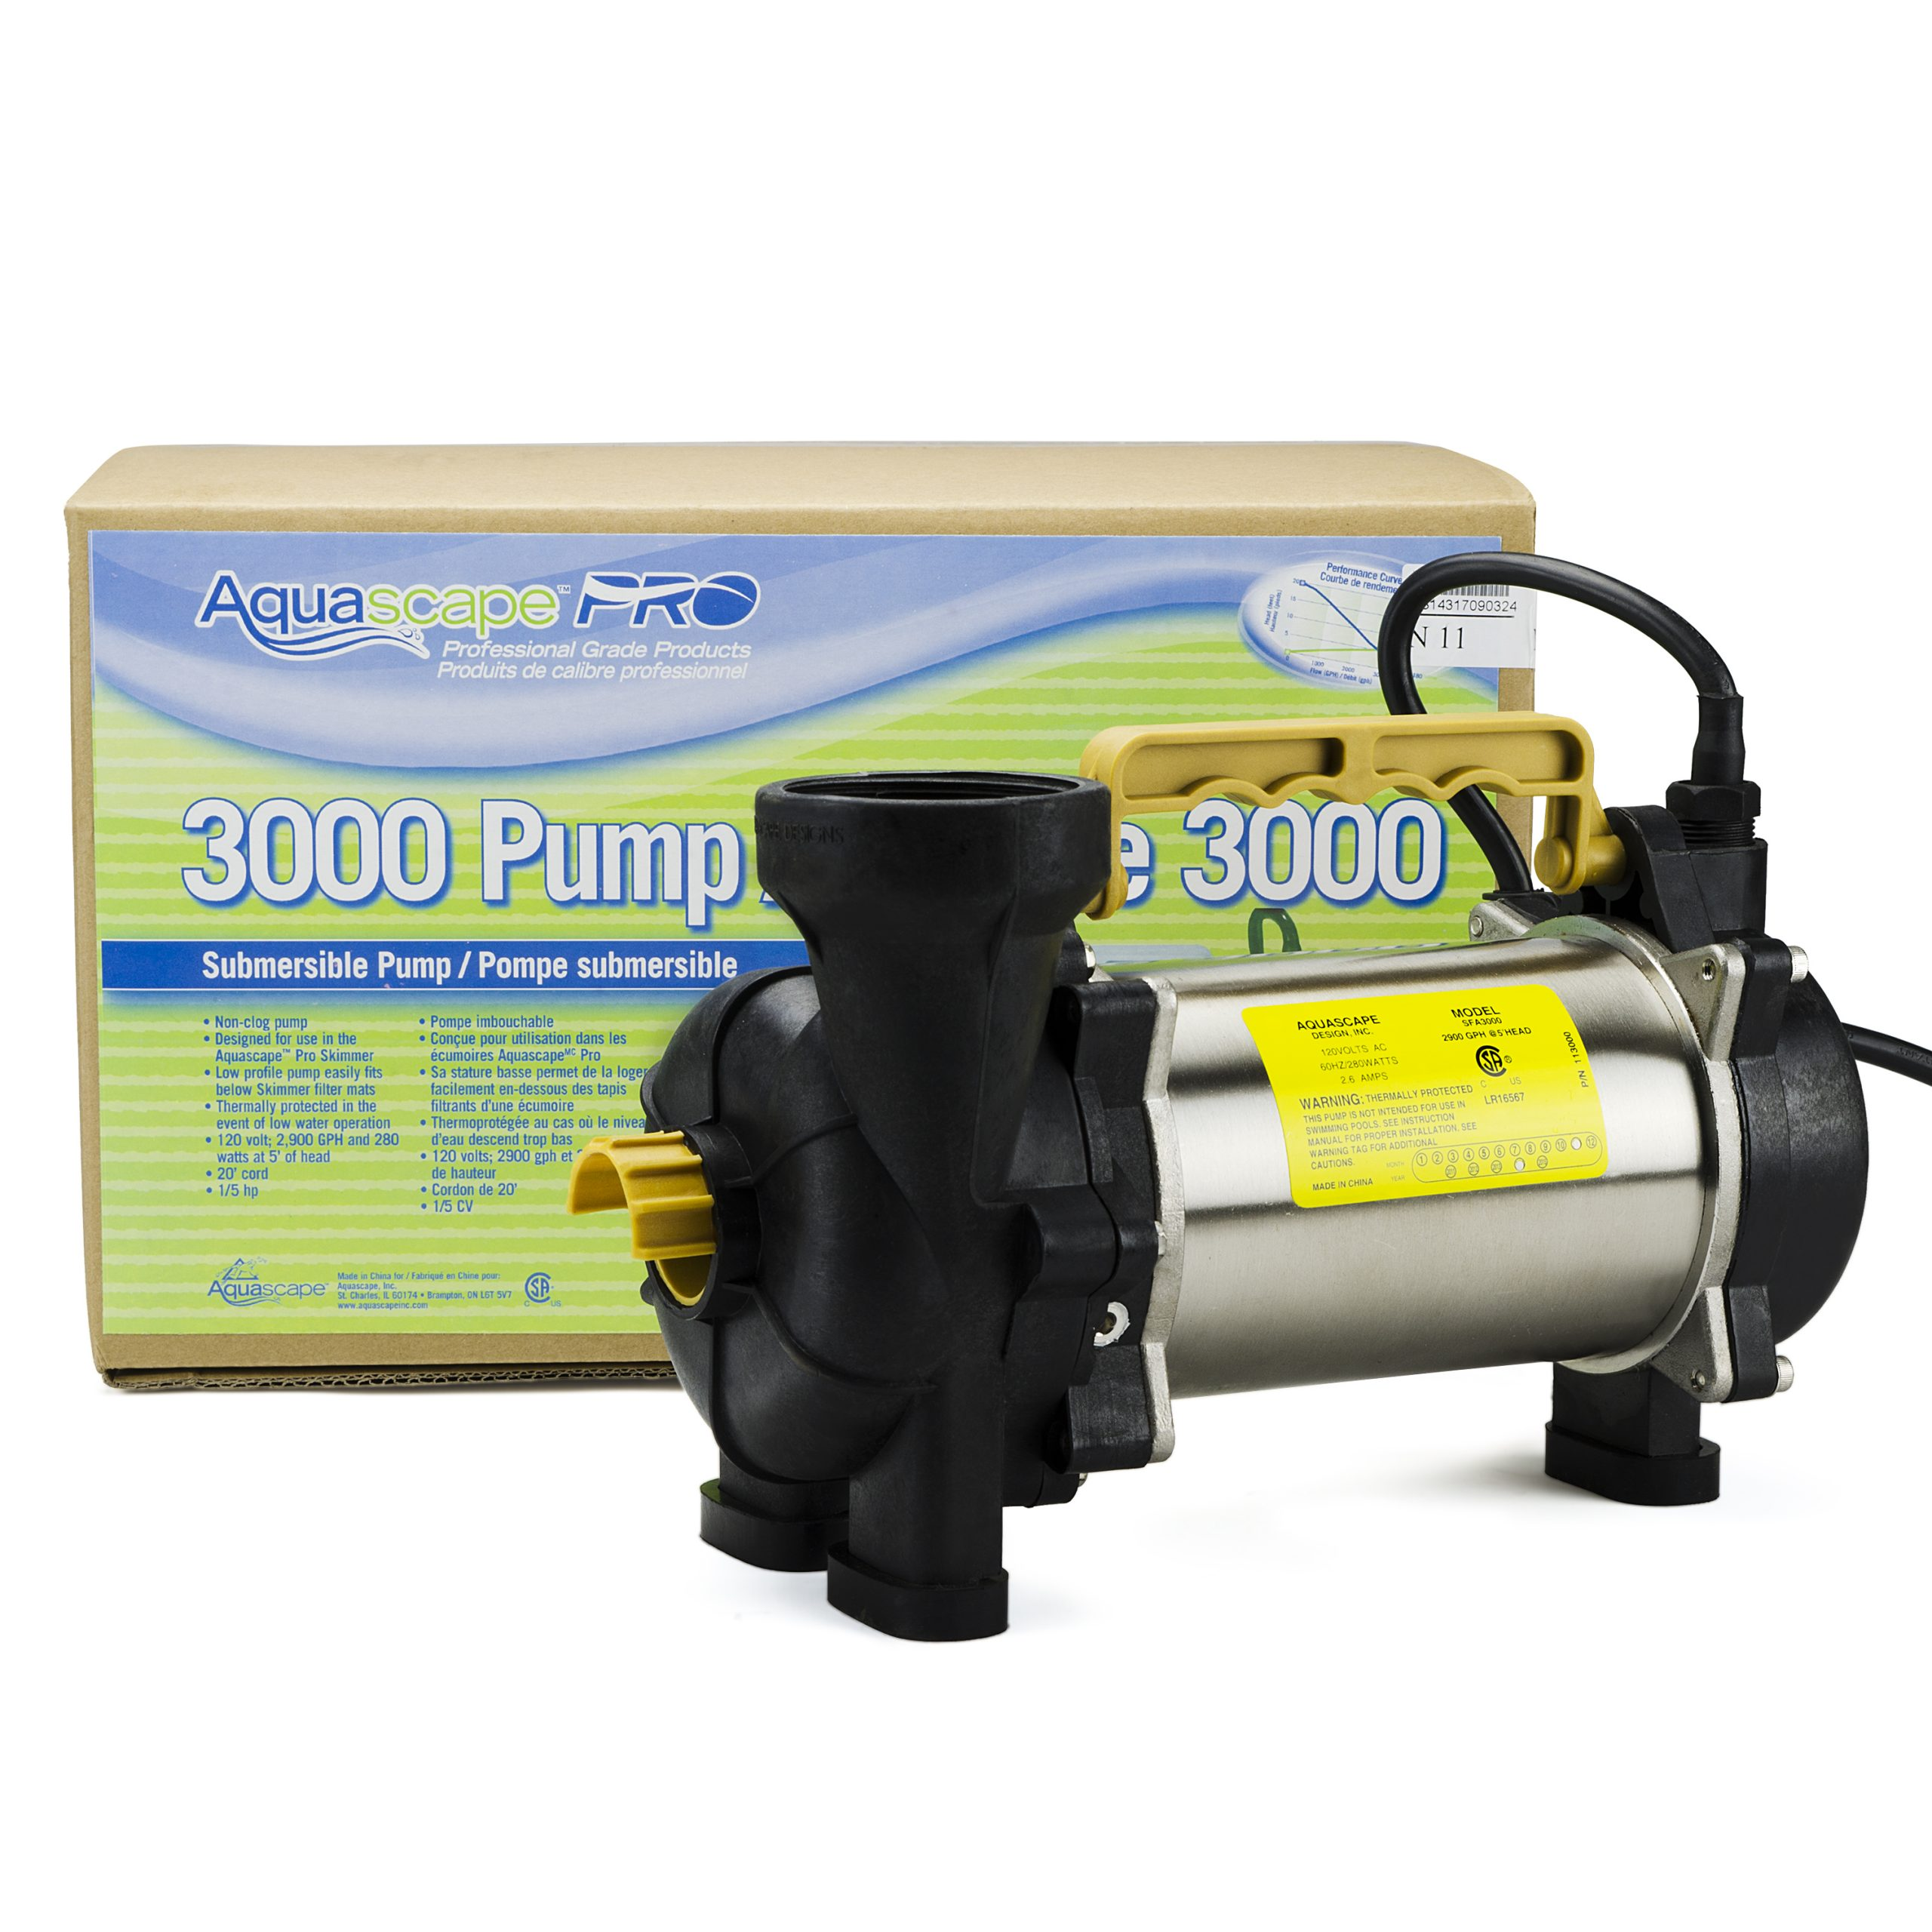 Aquascape AquascapePRO Pond Pump 2900 GPH - 20002 ...